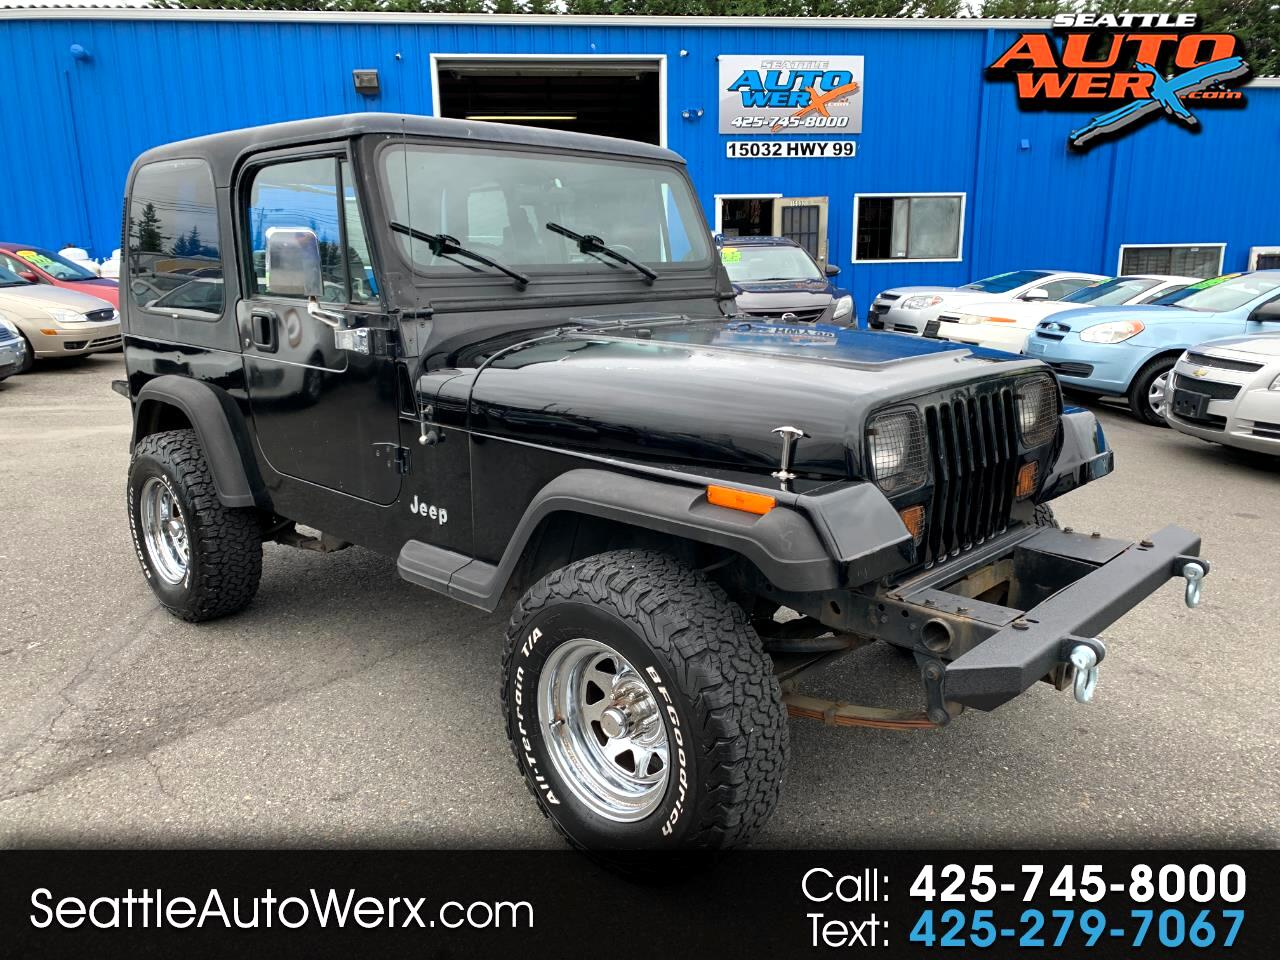 Jeep Wrangler 2dr S 1995